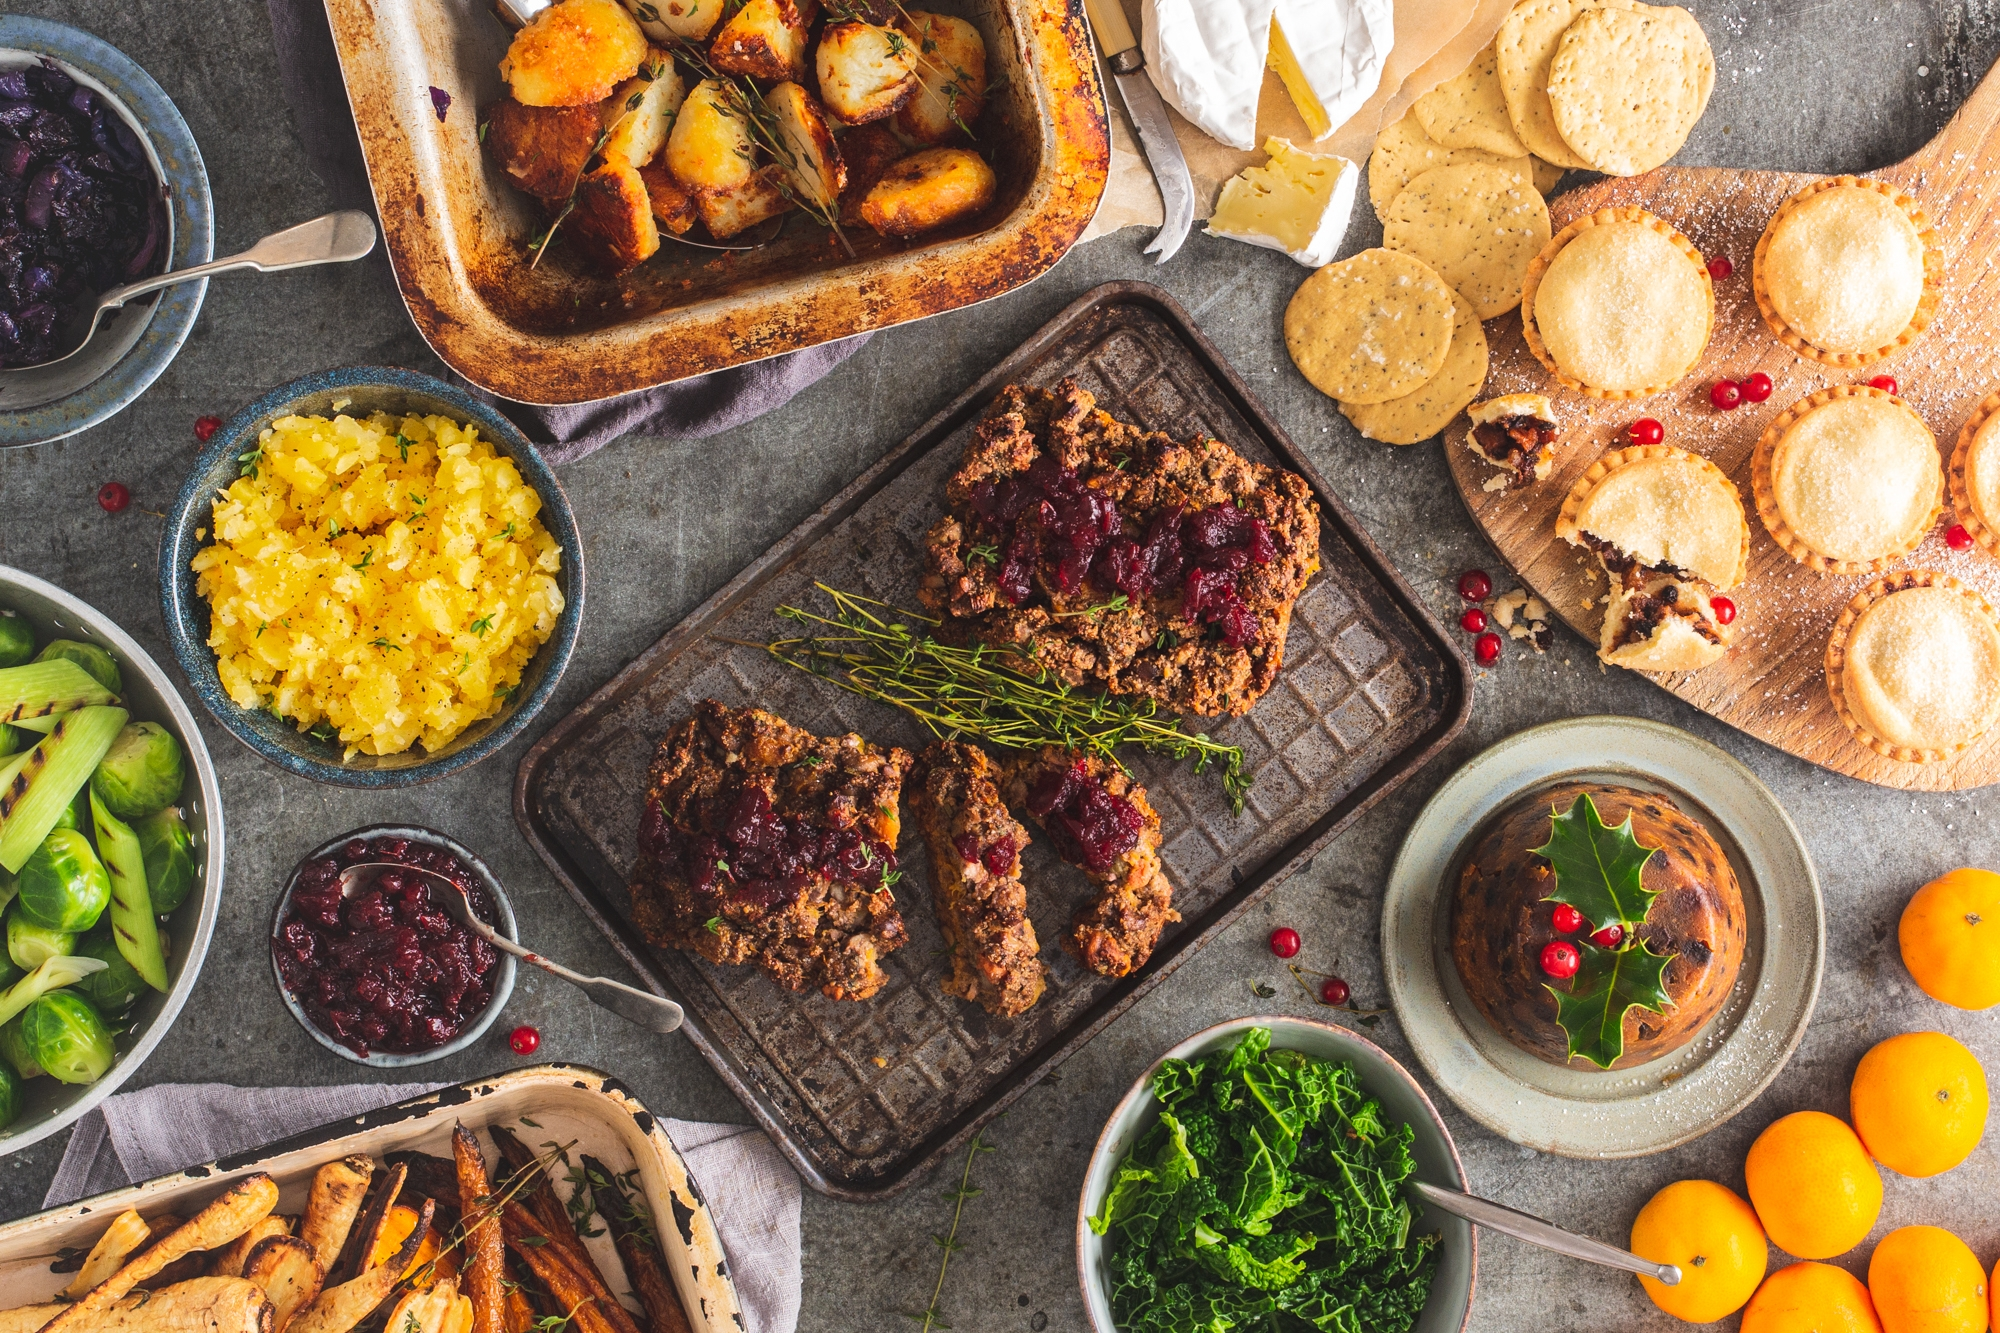 Vegetarian Christmas dinner box with nut roast